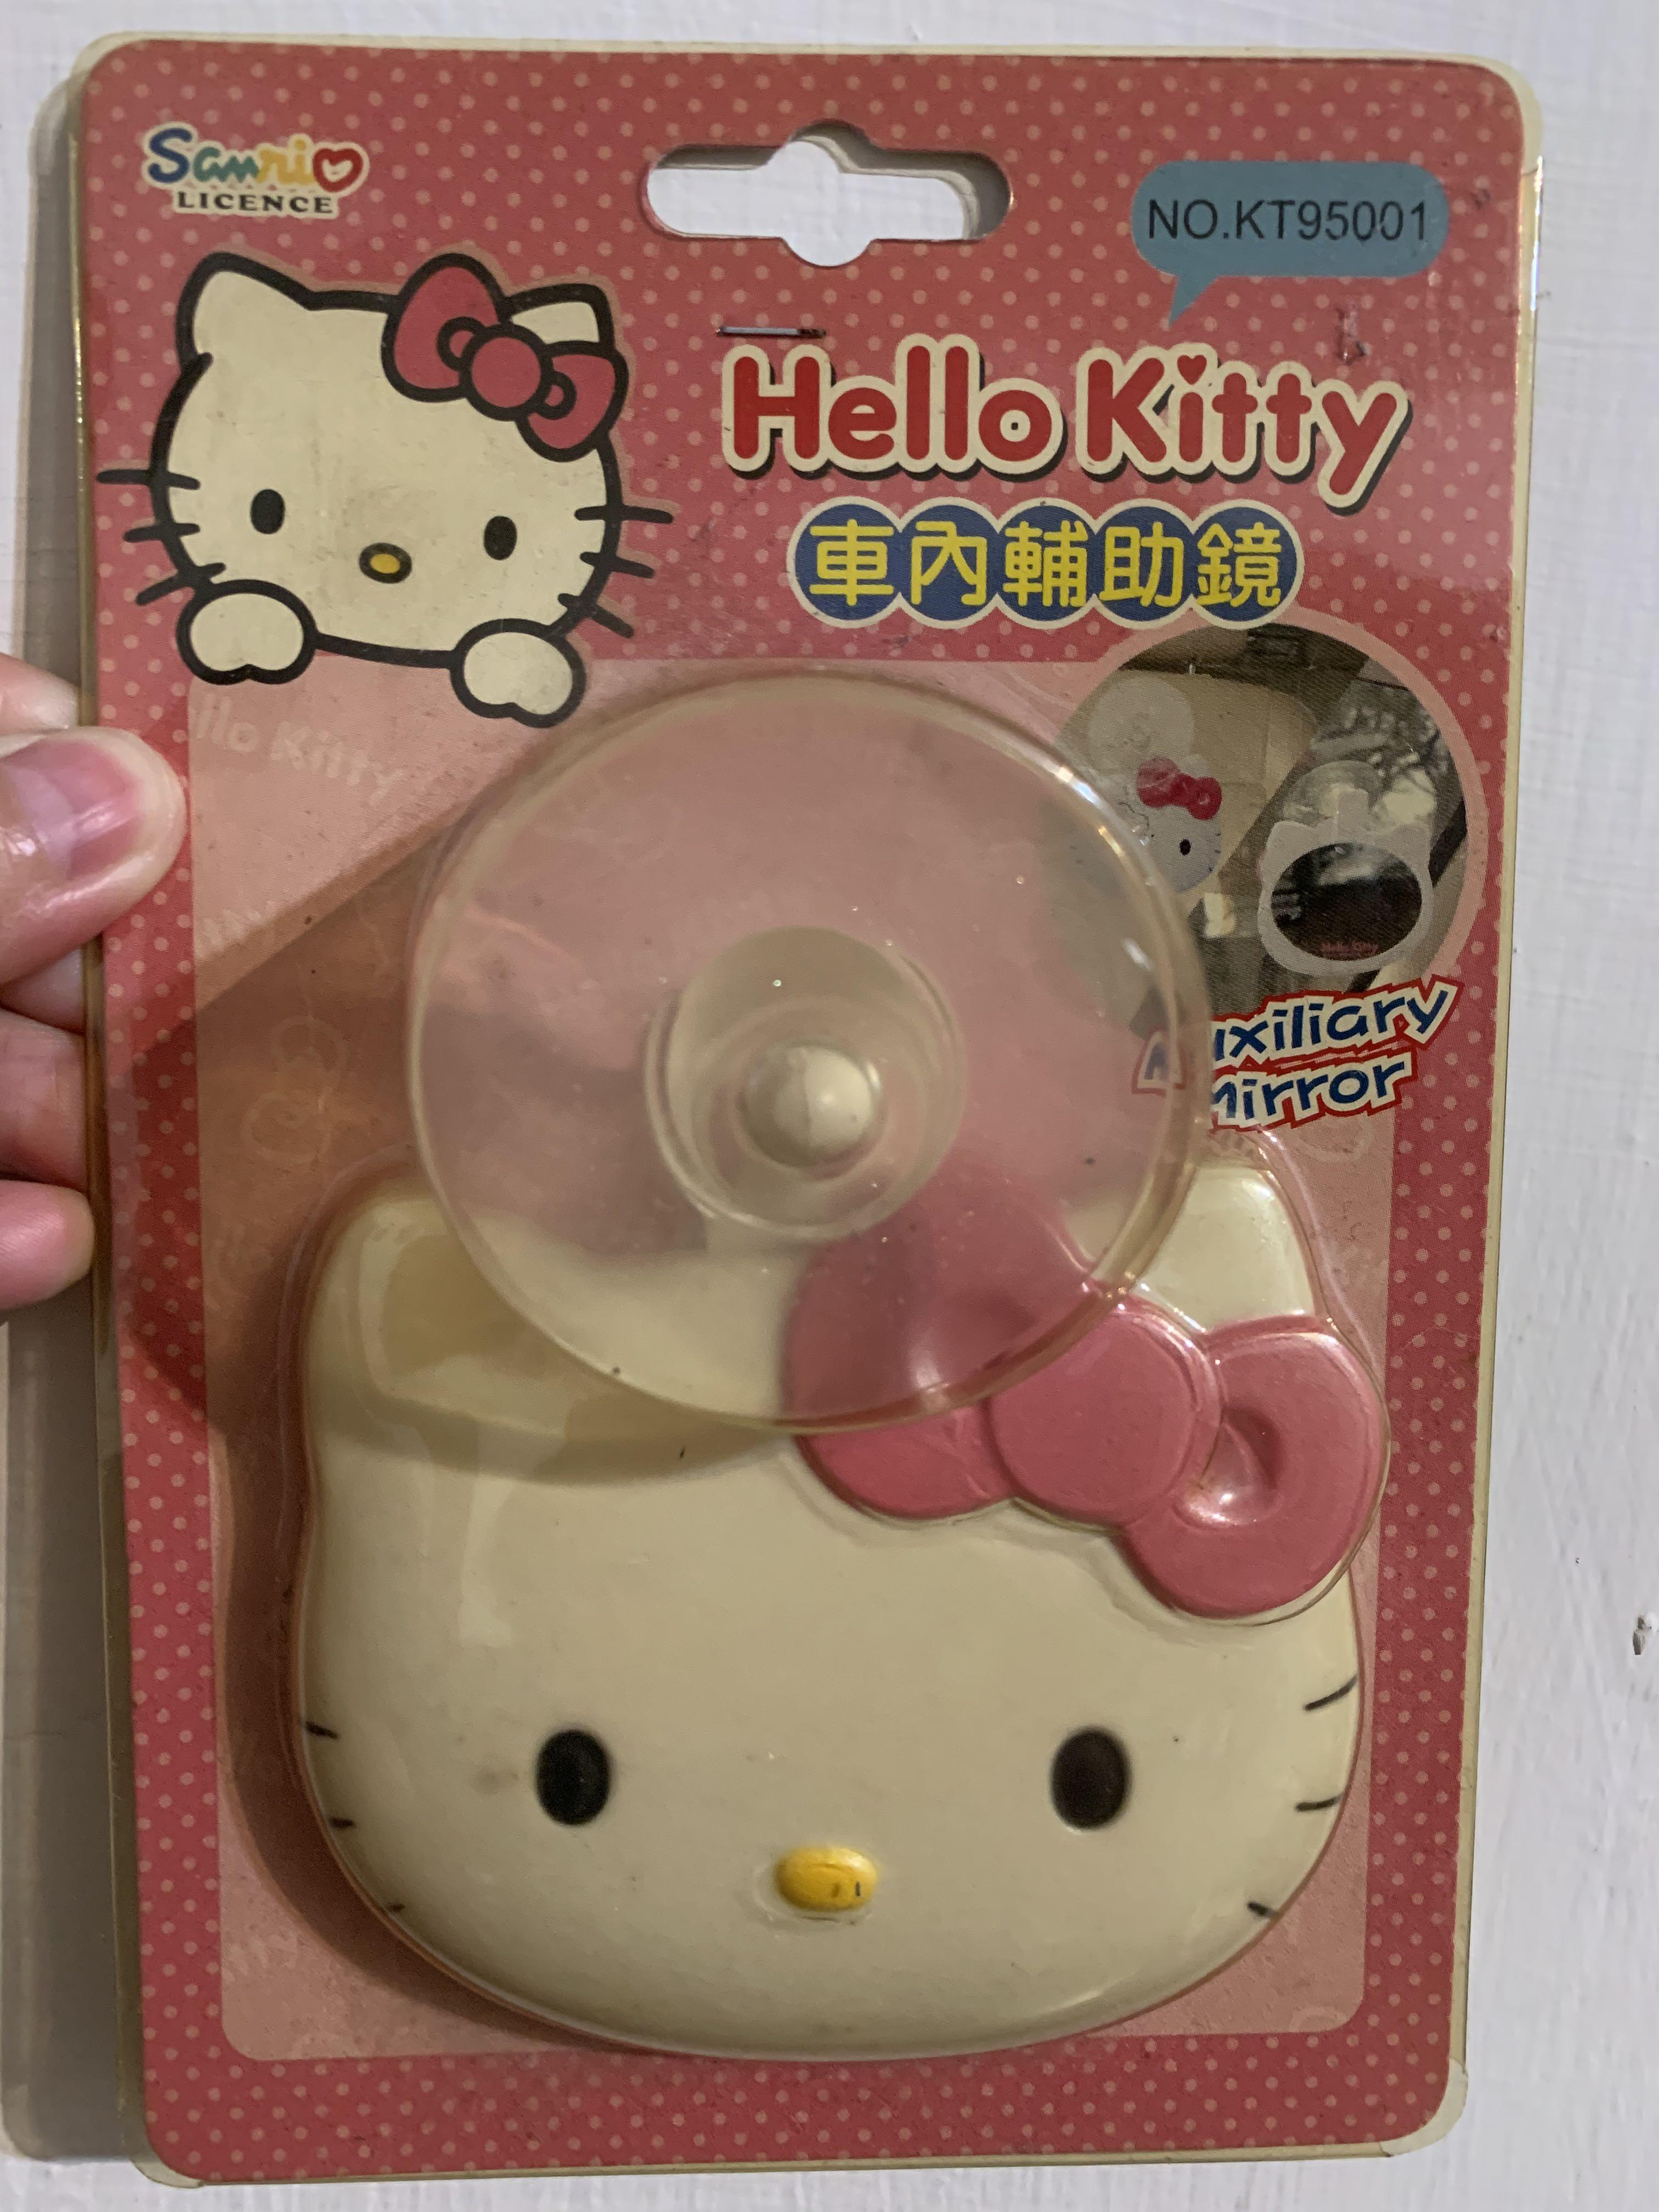 Hello kitty 車內輔助鏡